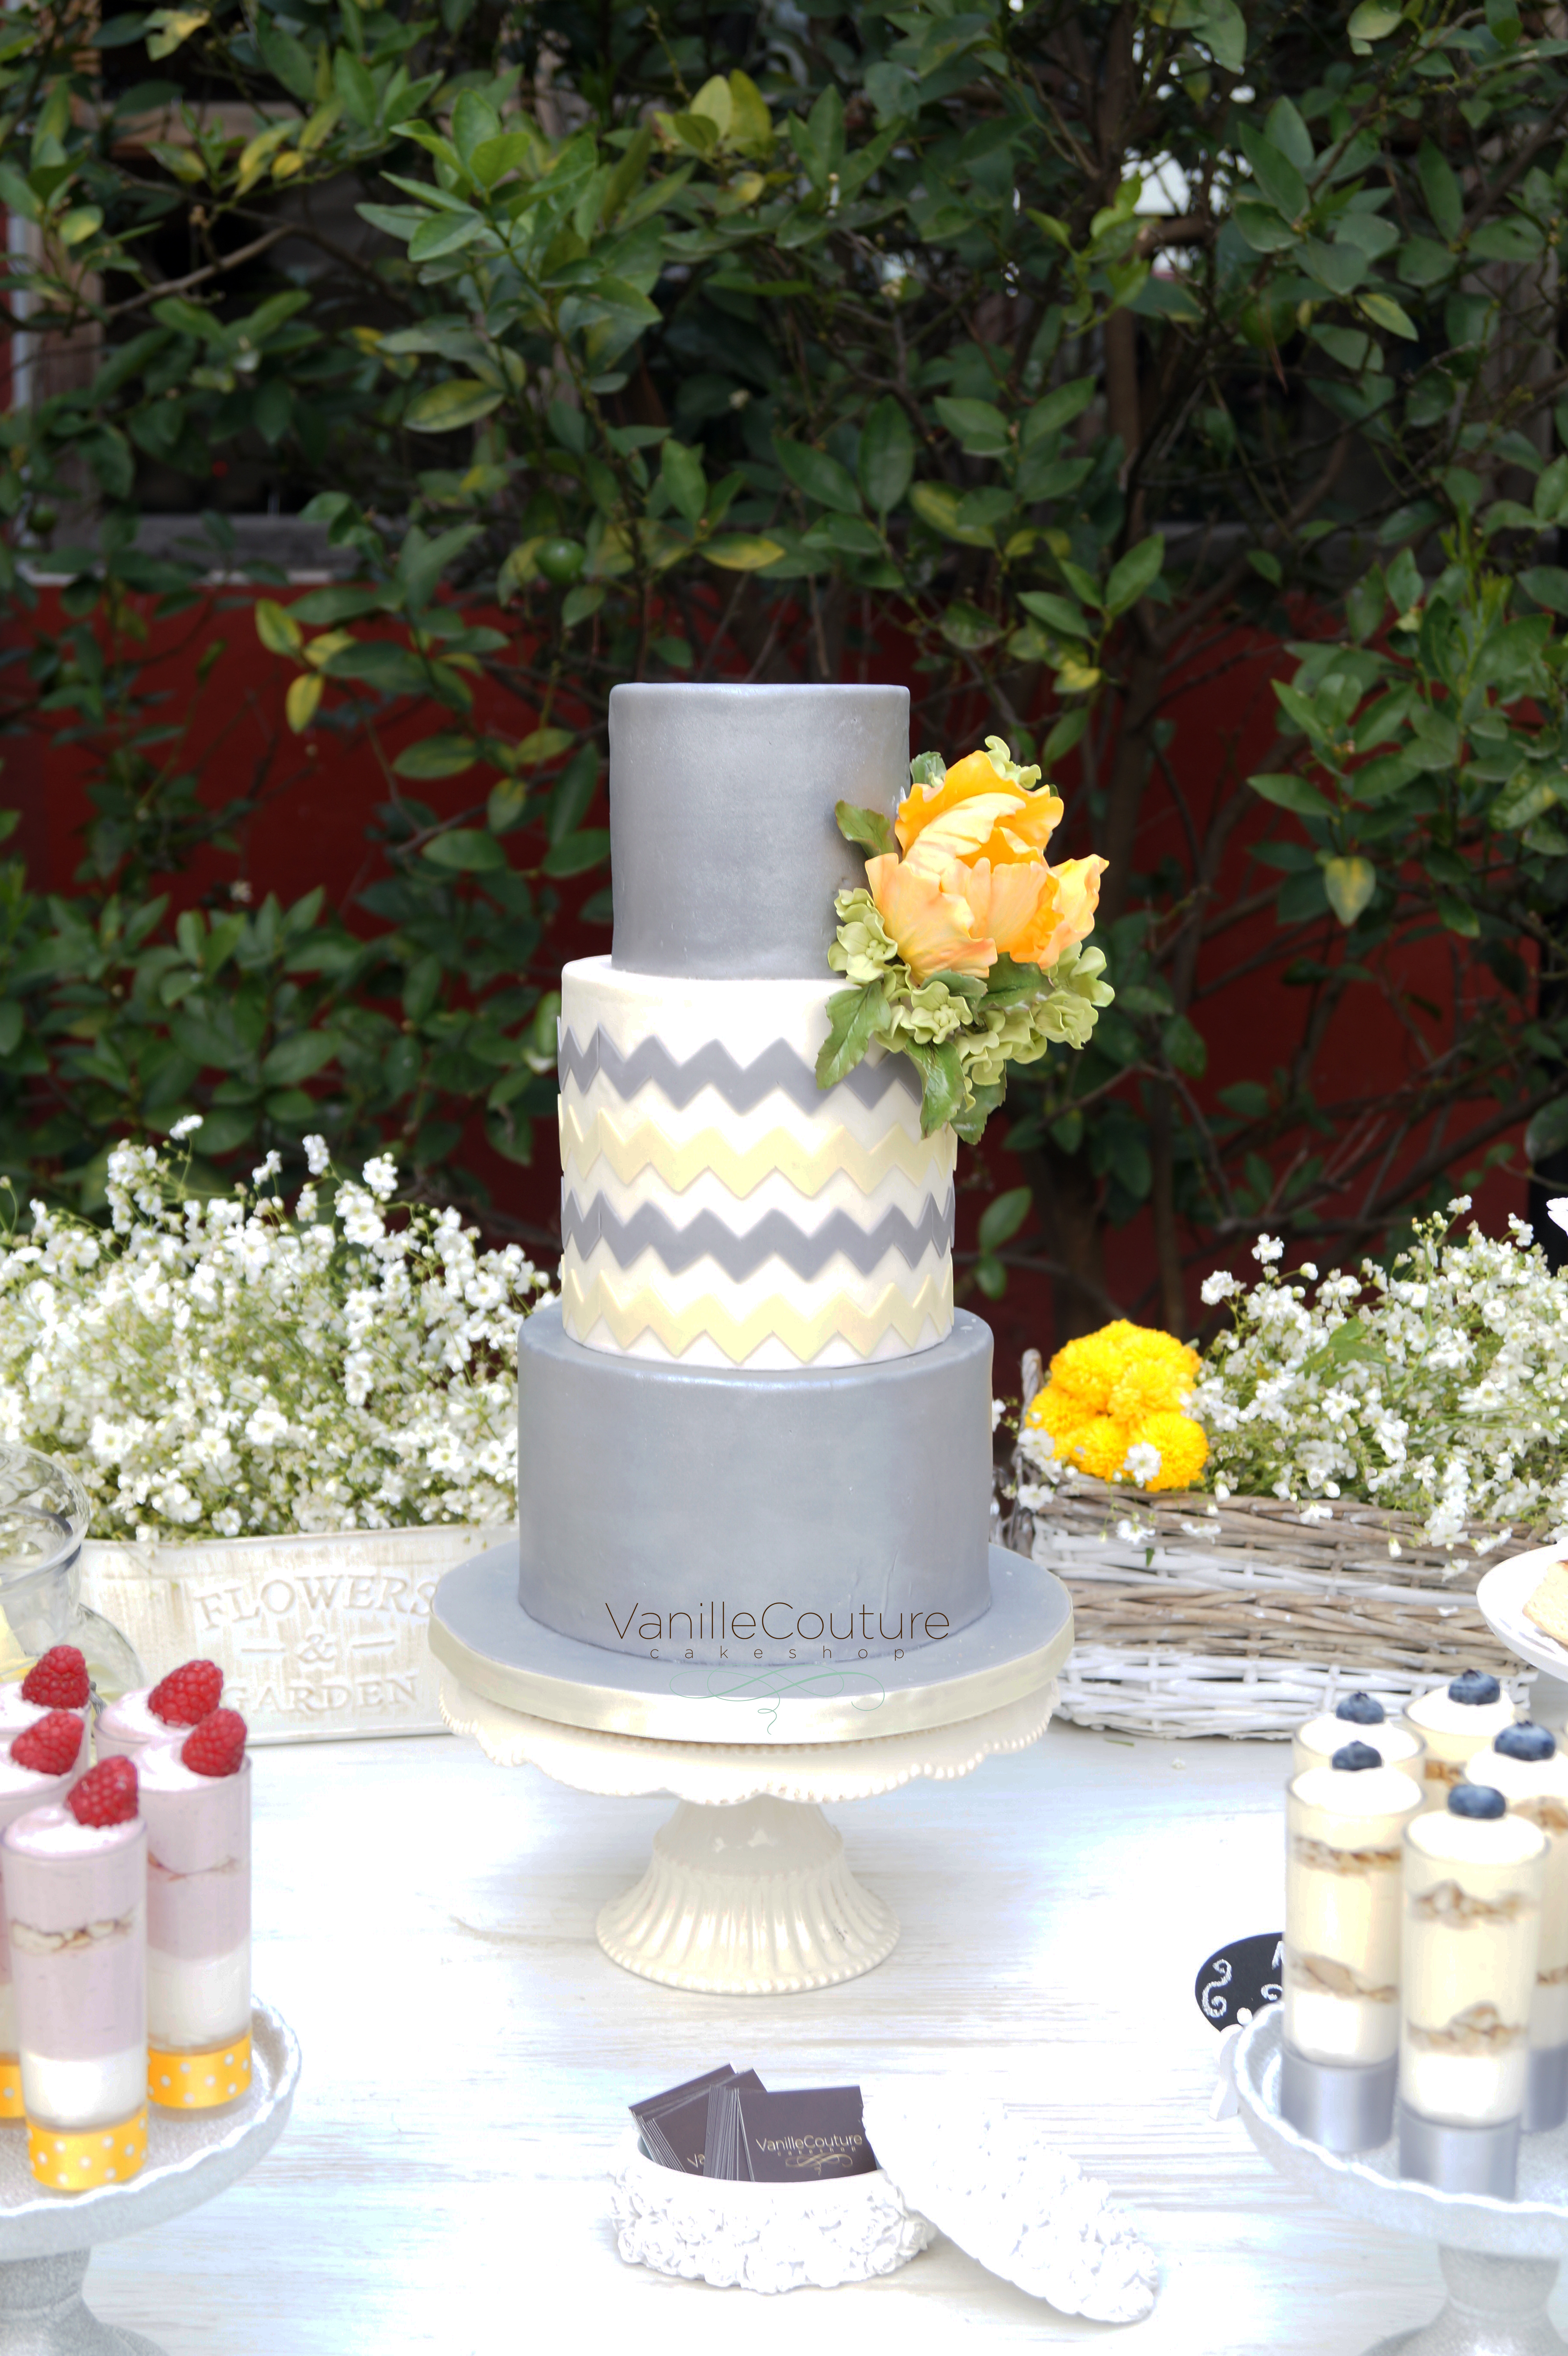 Chevron gray and white fondant Wedding cake